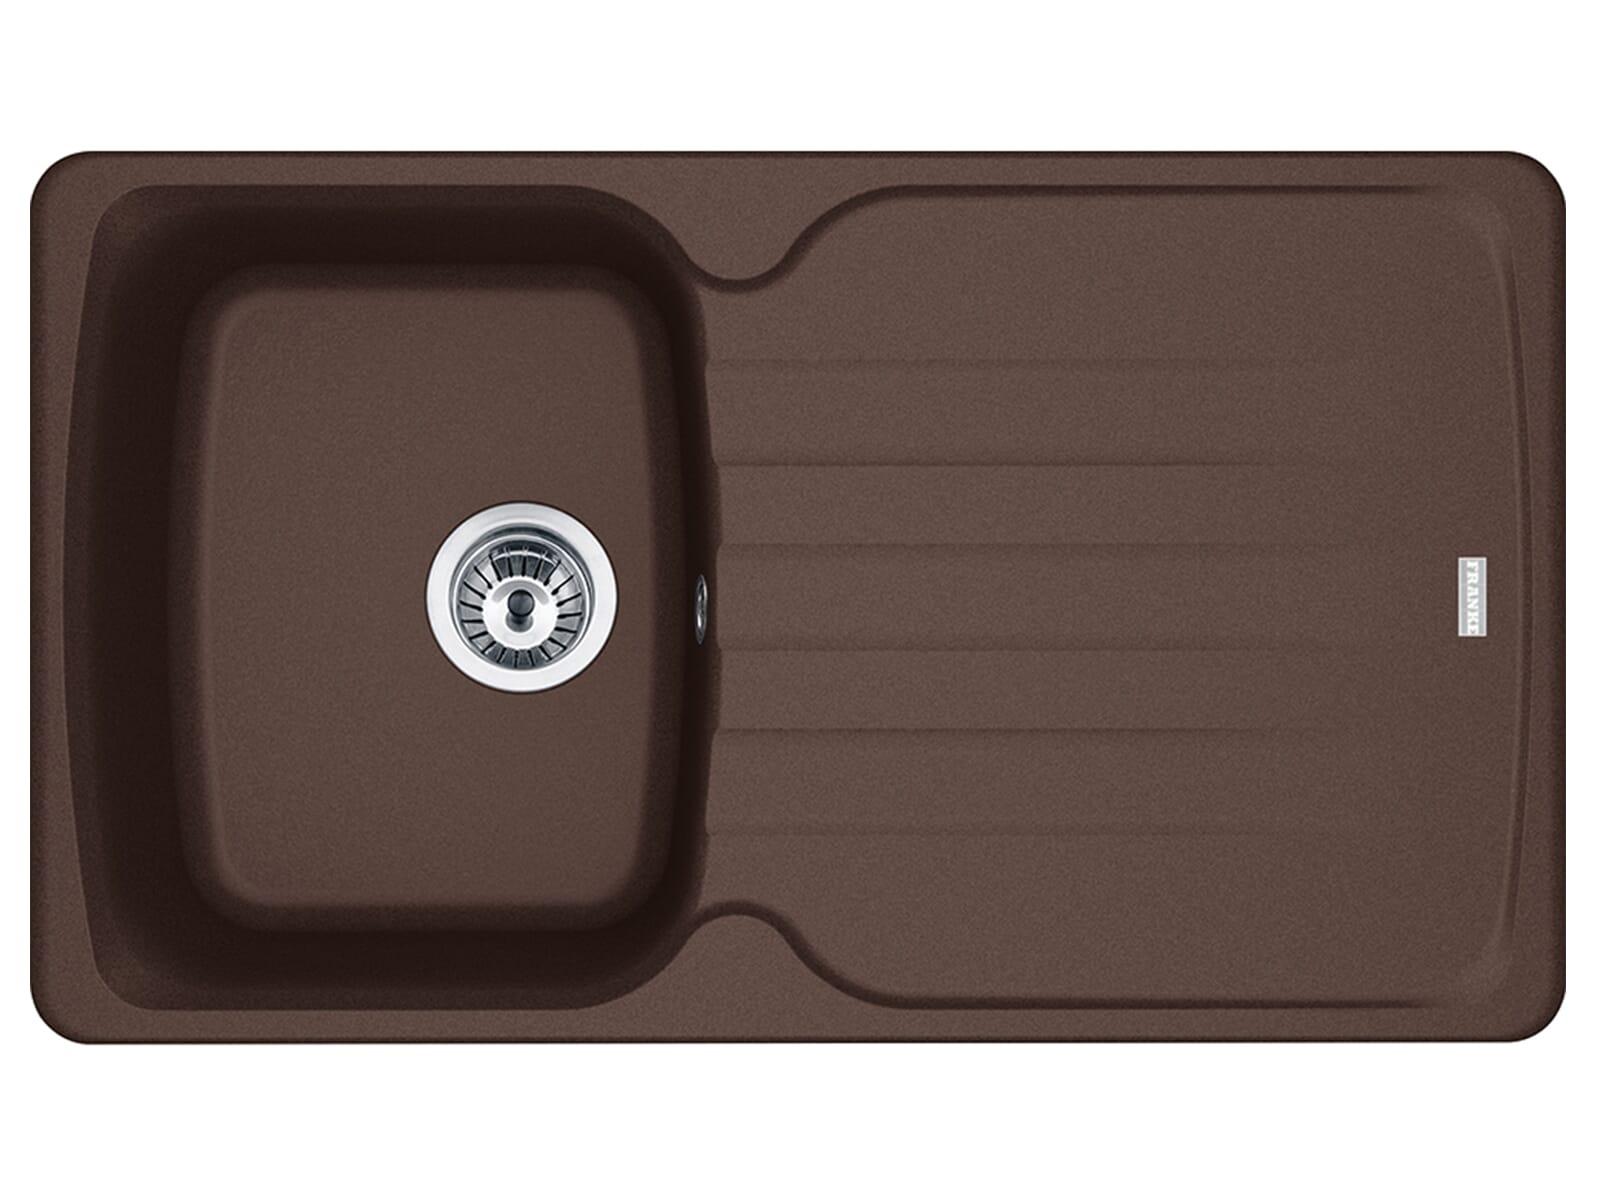 Franke Antea AZG 611 Chocolate - 114.0477.975 Granitspüle Exzenterbetätigung